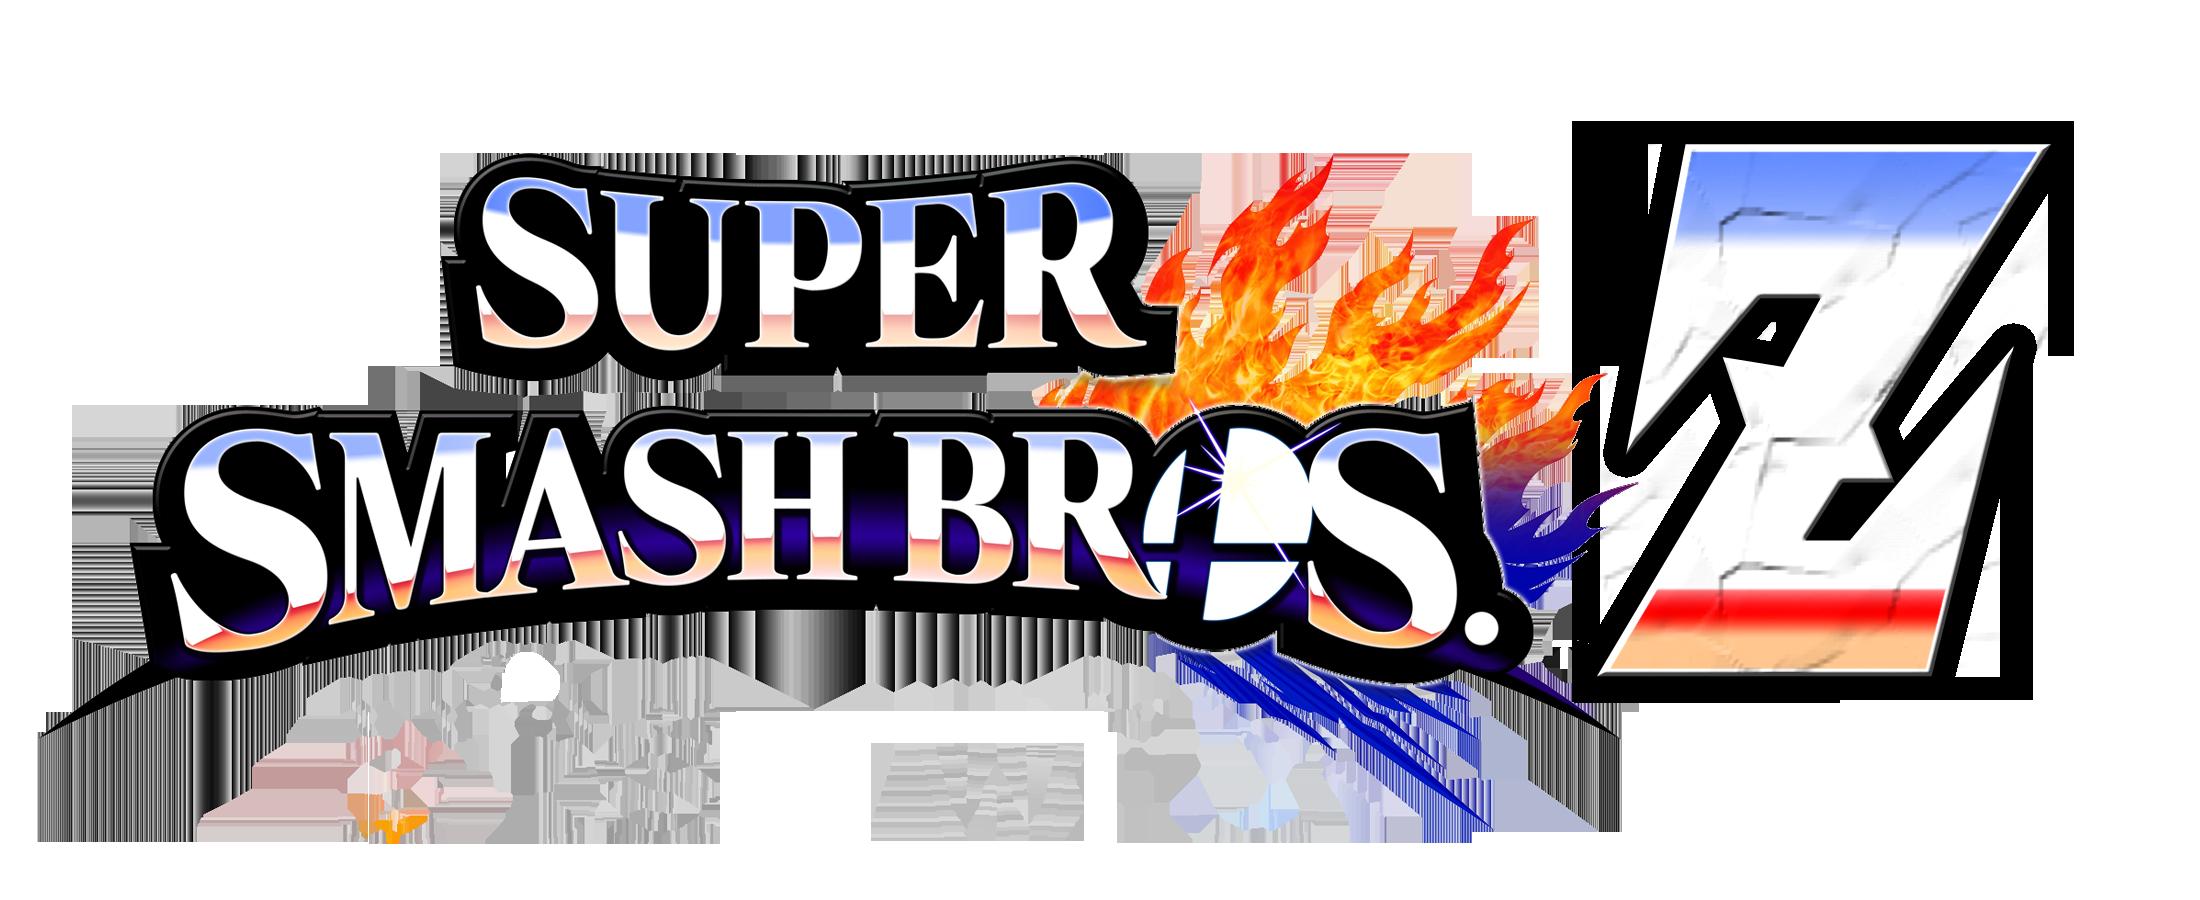 Super Smash Bros Z Revamped Logo by KingAsylus91